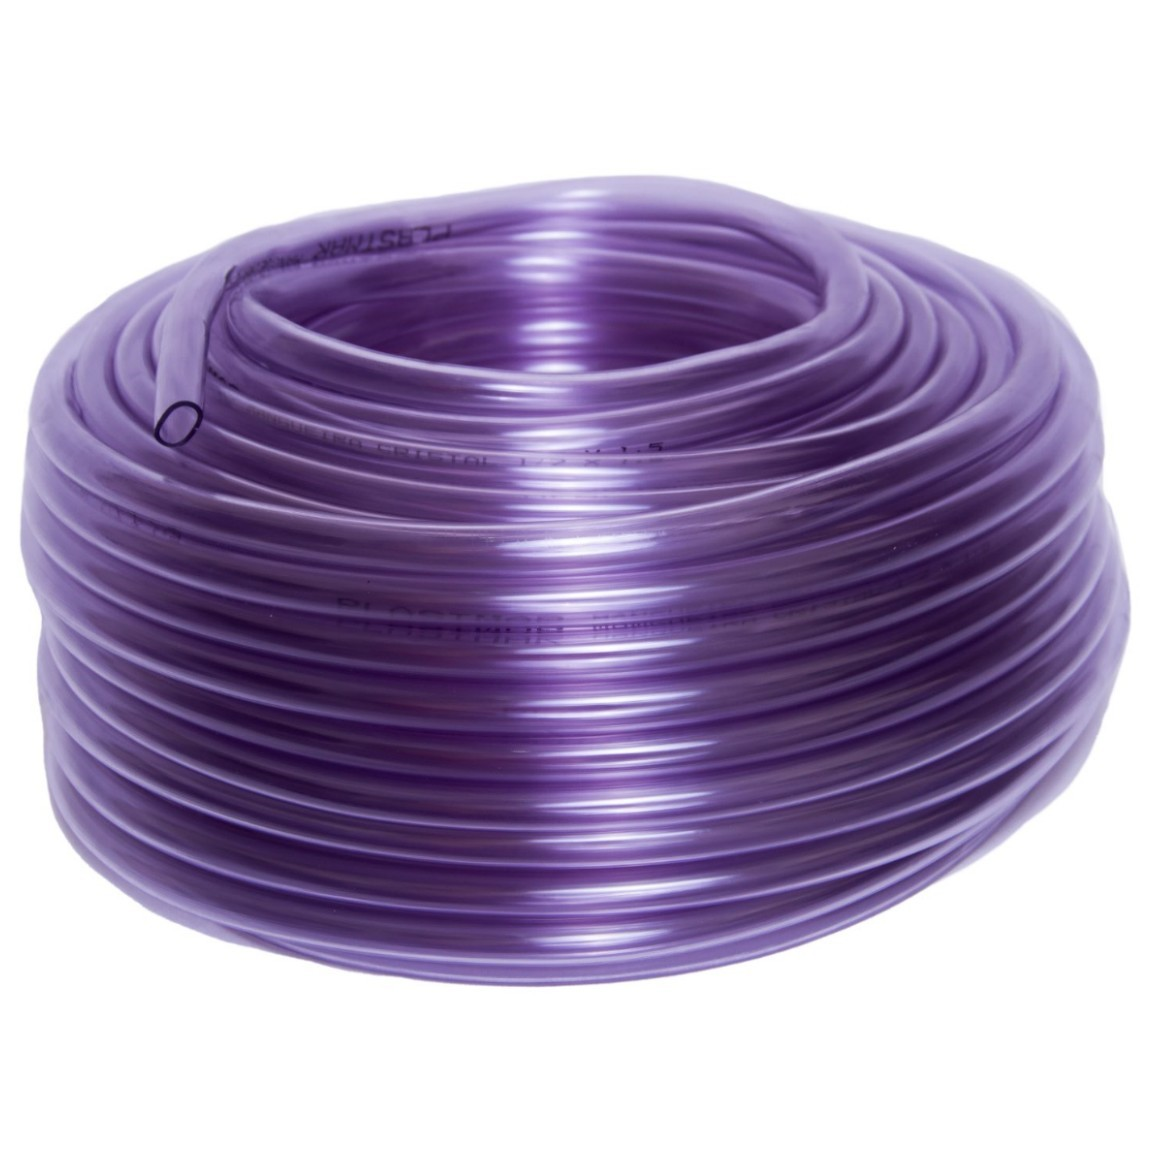 Mangueira de PVC 20m 14 Roxa 786 - Plastmar